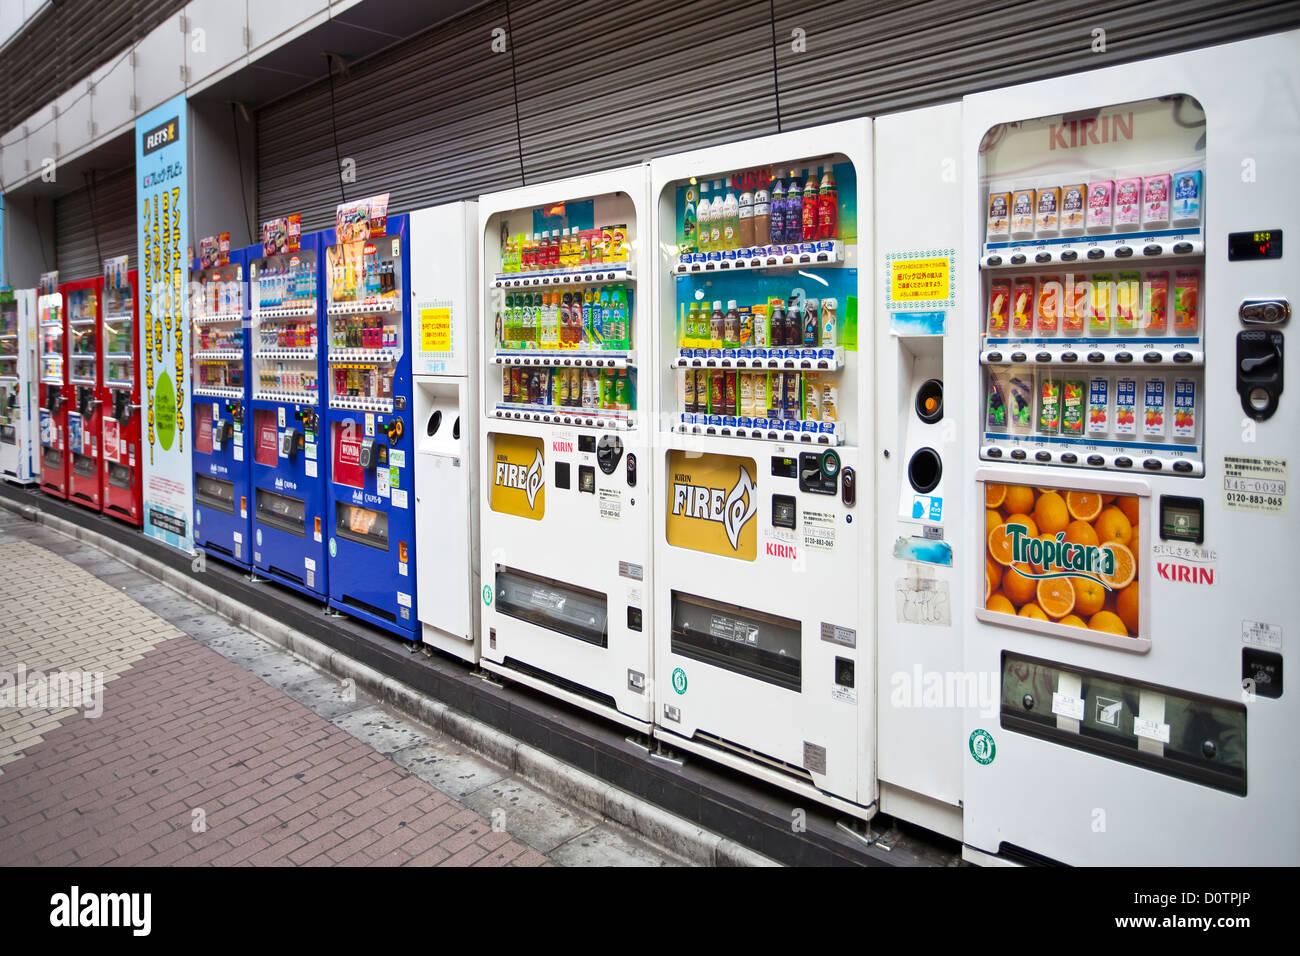 Japan, Asia, holiday, travel, Tokyo, City, Ueno, District, Vending Machines, dispenser, display, drinks, food, vendor, - Stock Image